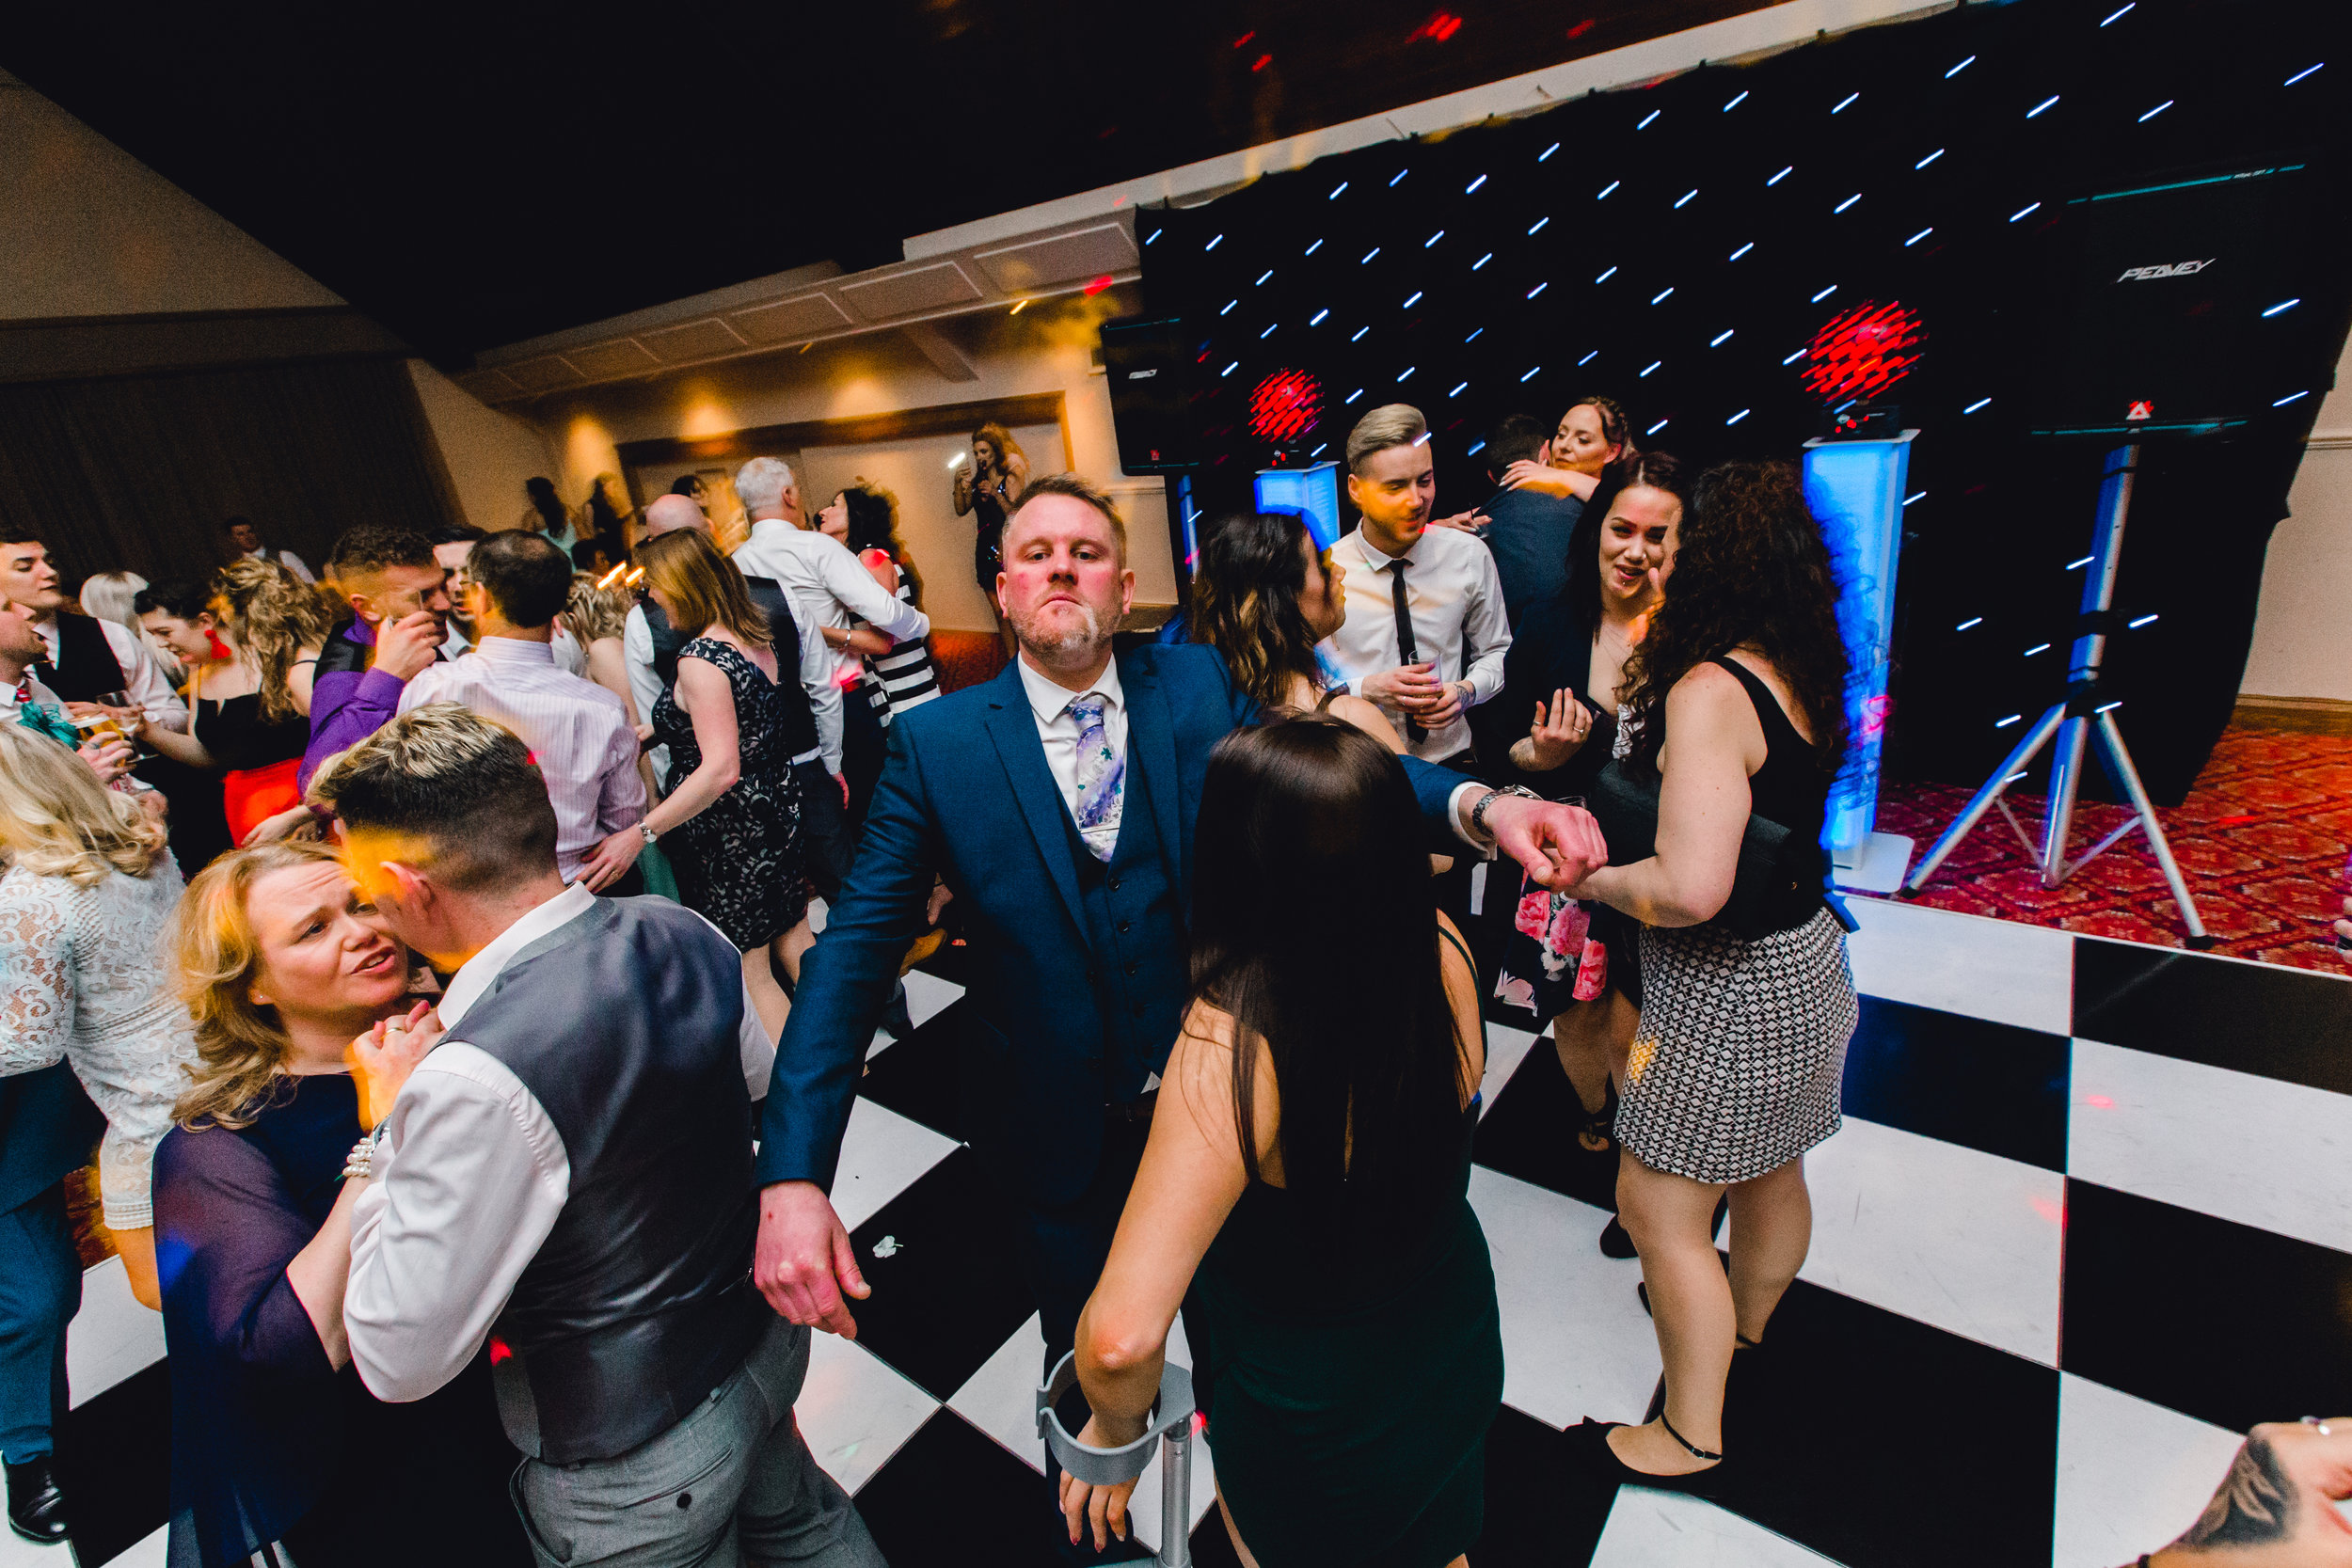 Dance floor photo at cedar court hotel huddersfield